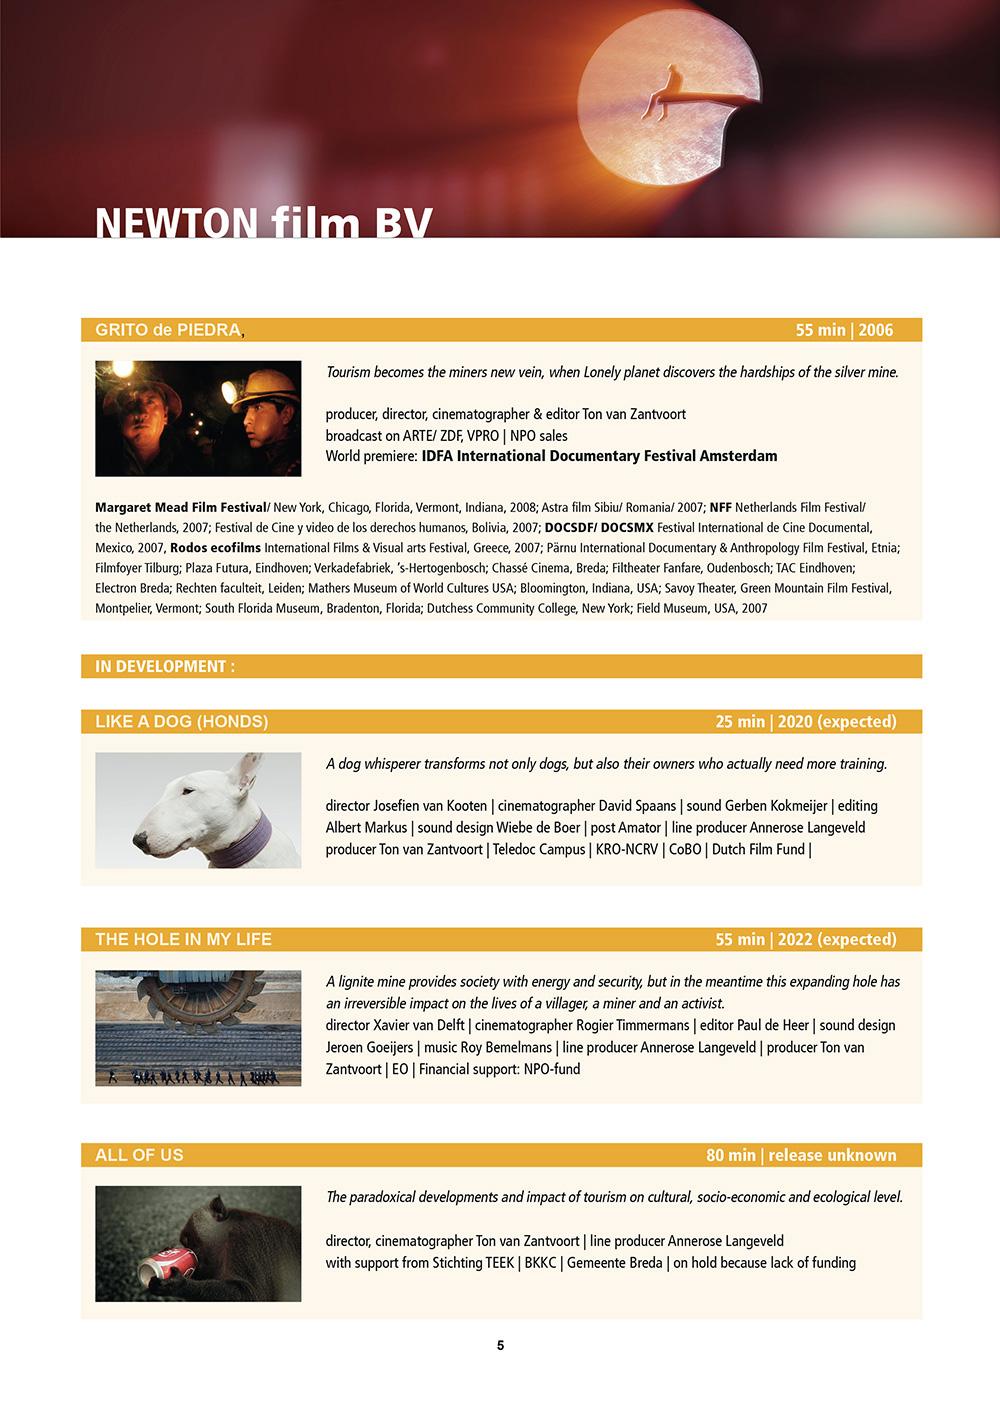 NEWTON-film-cv-page-5of5